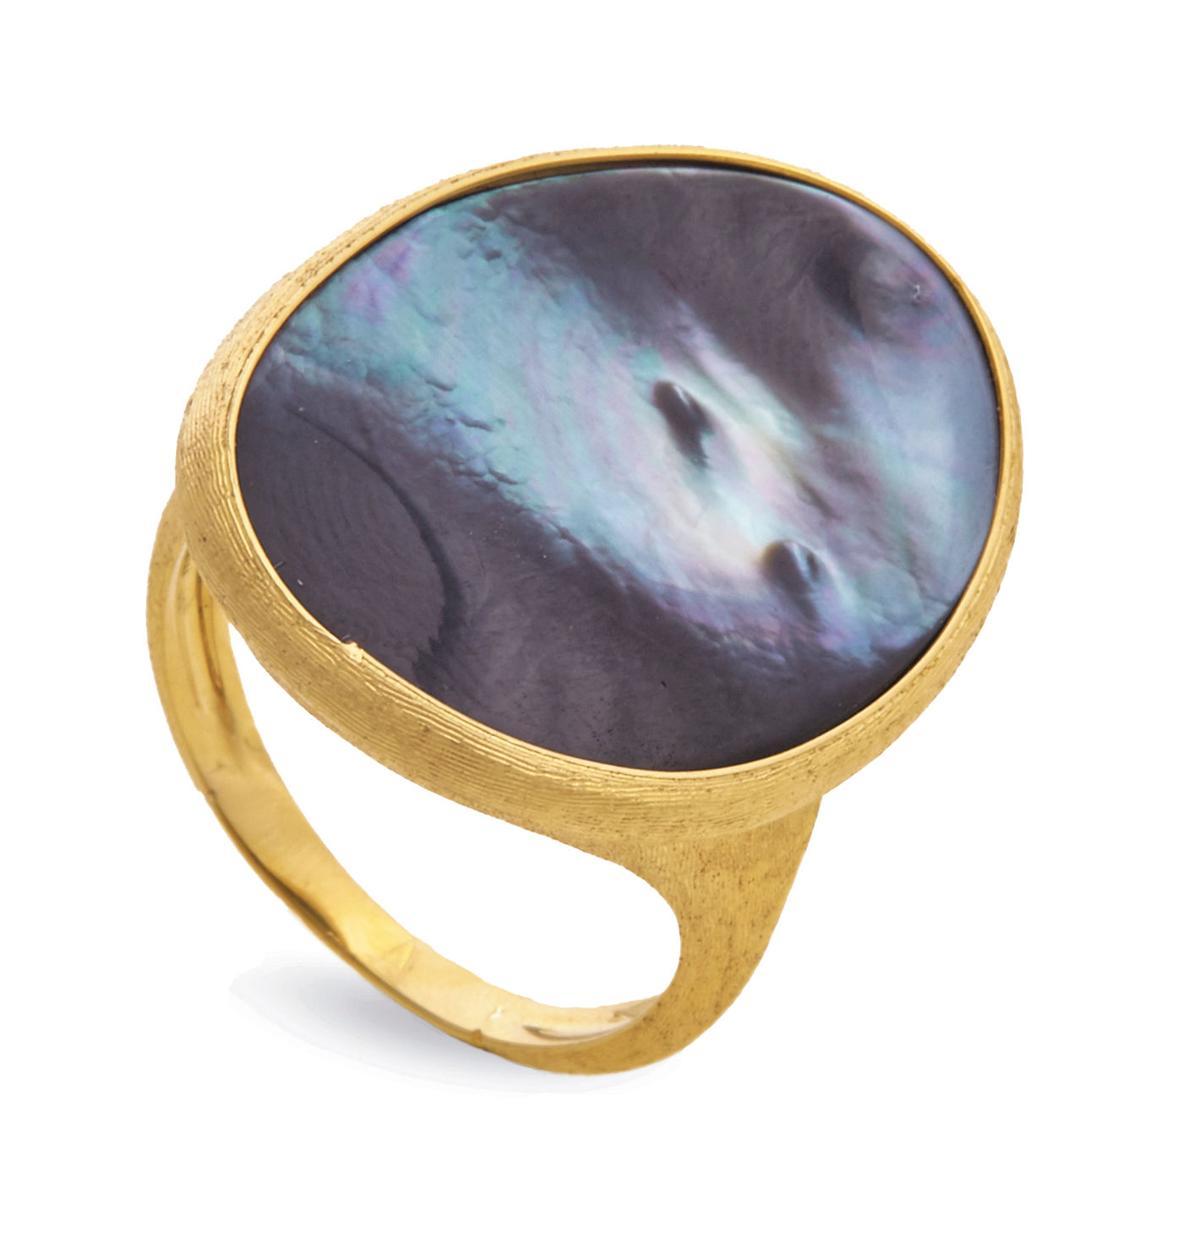 Aucoin Hart - Ring.jpg